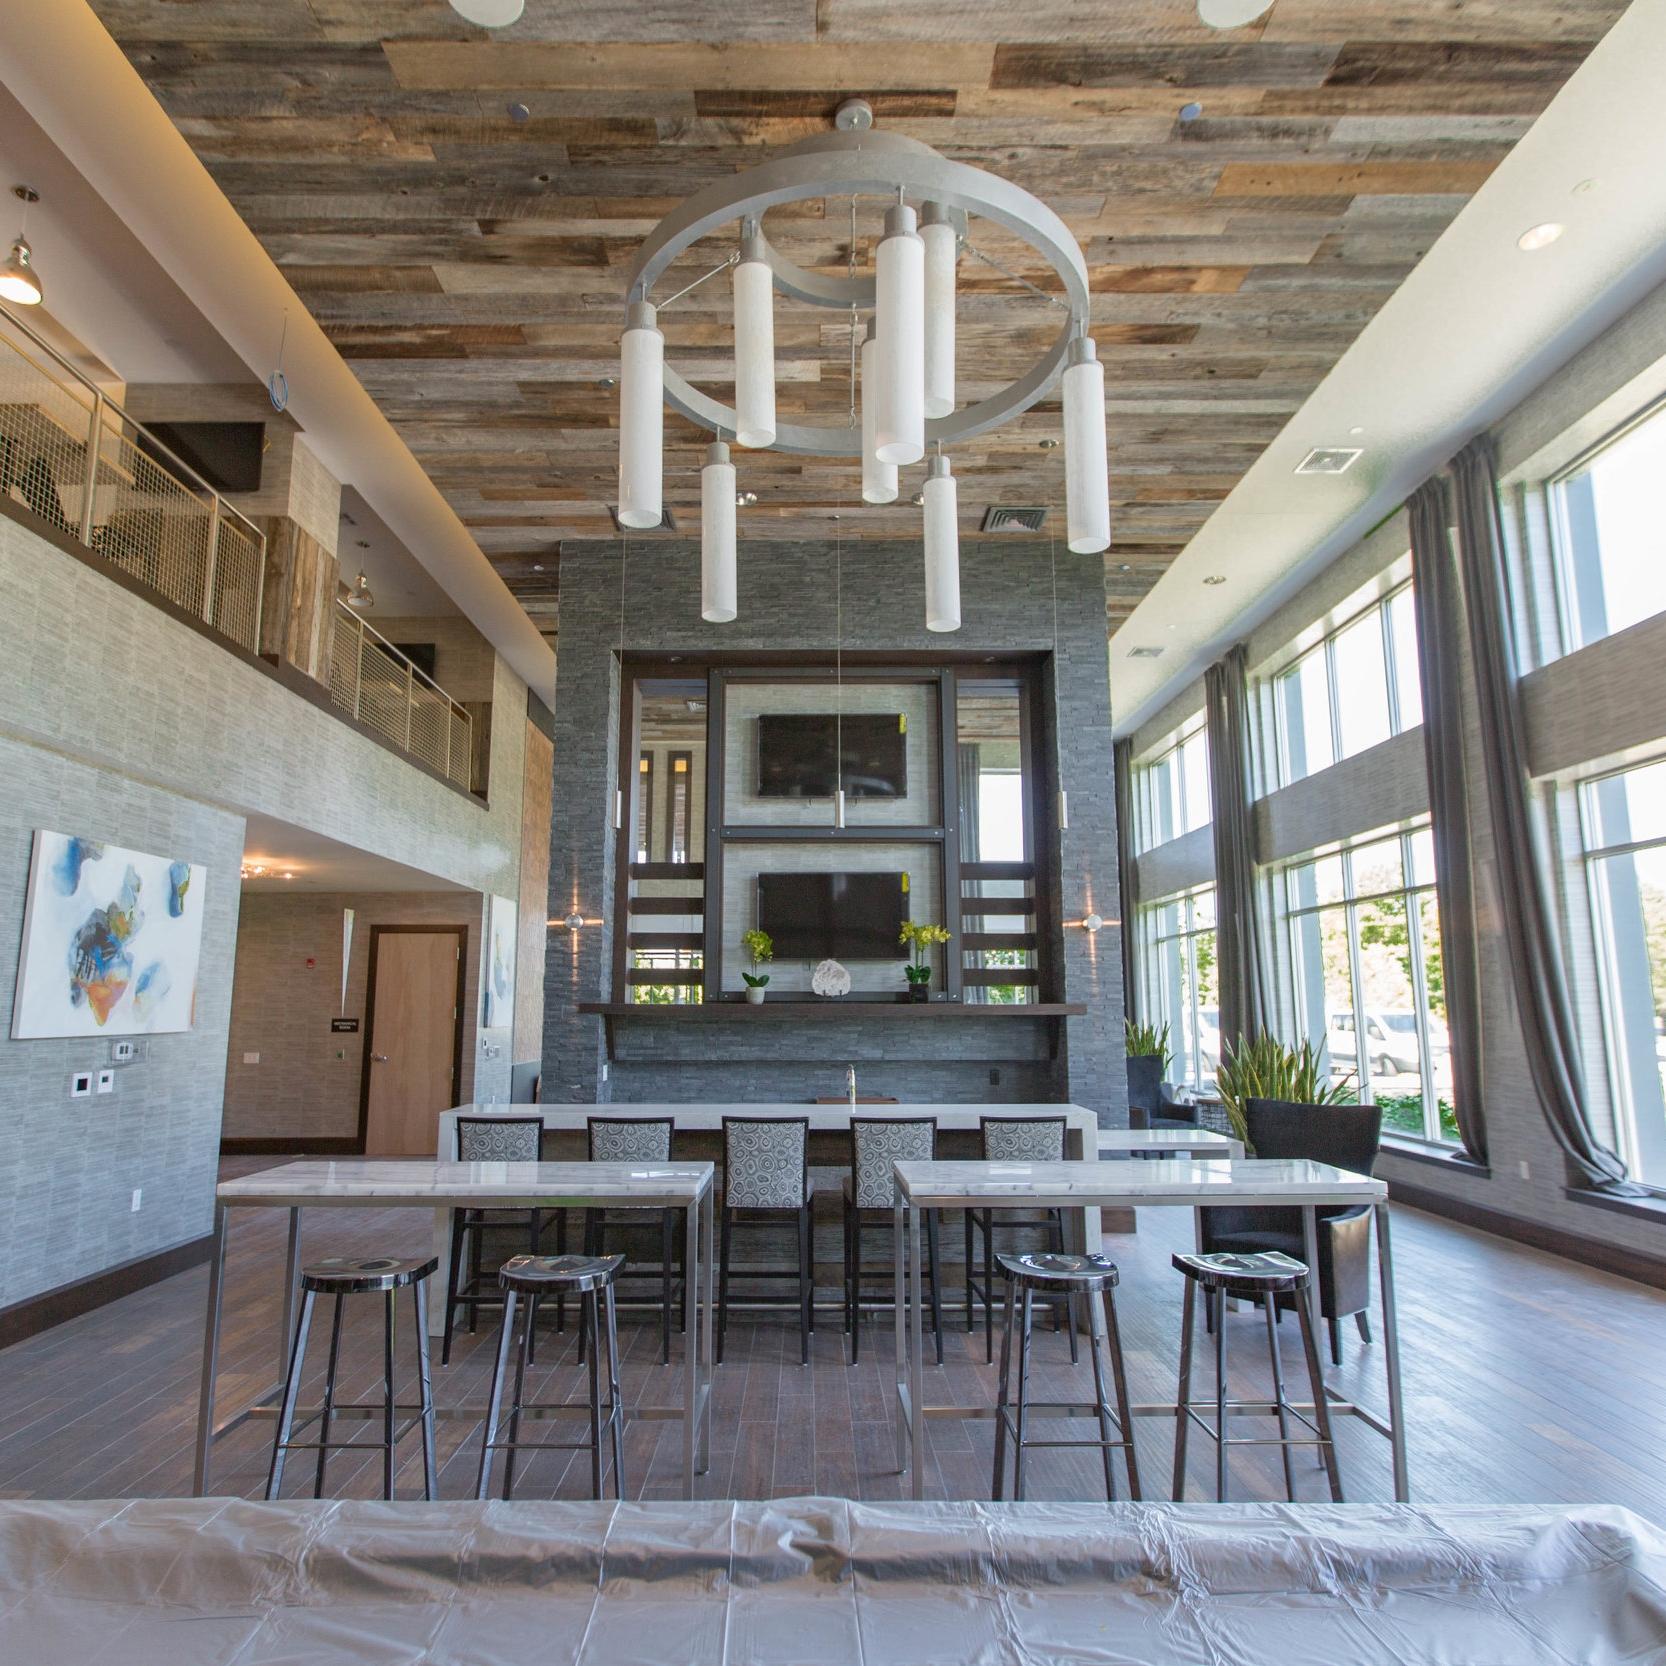 Modera Medford   Medford, Massachusetts 297 Apartment Homes 5 Floors 602-1479 sqft Spaces